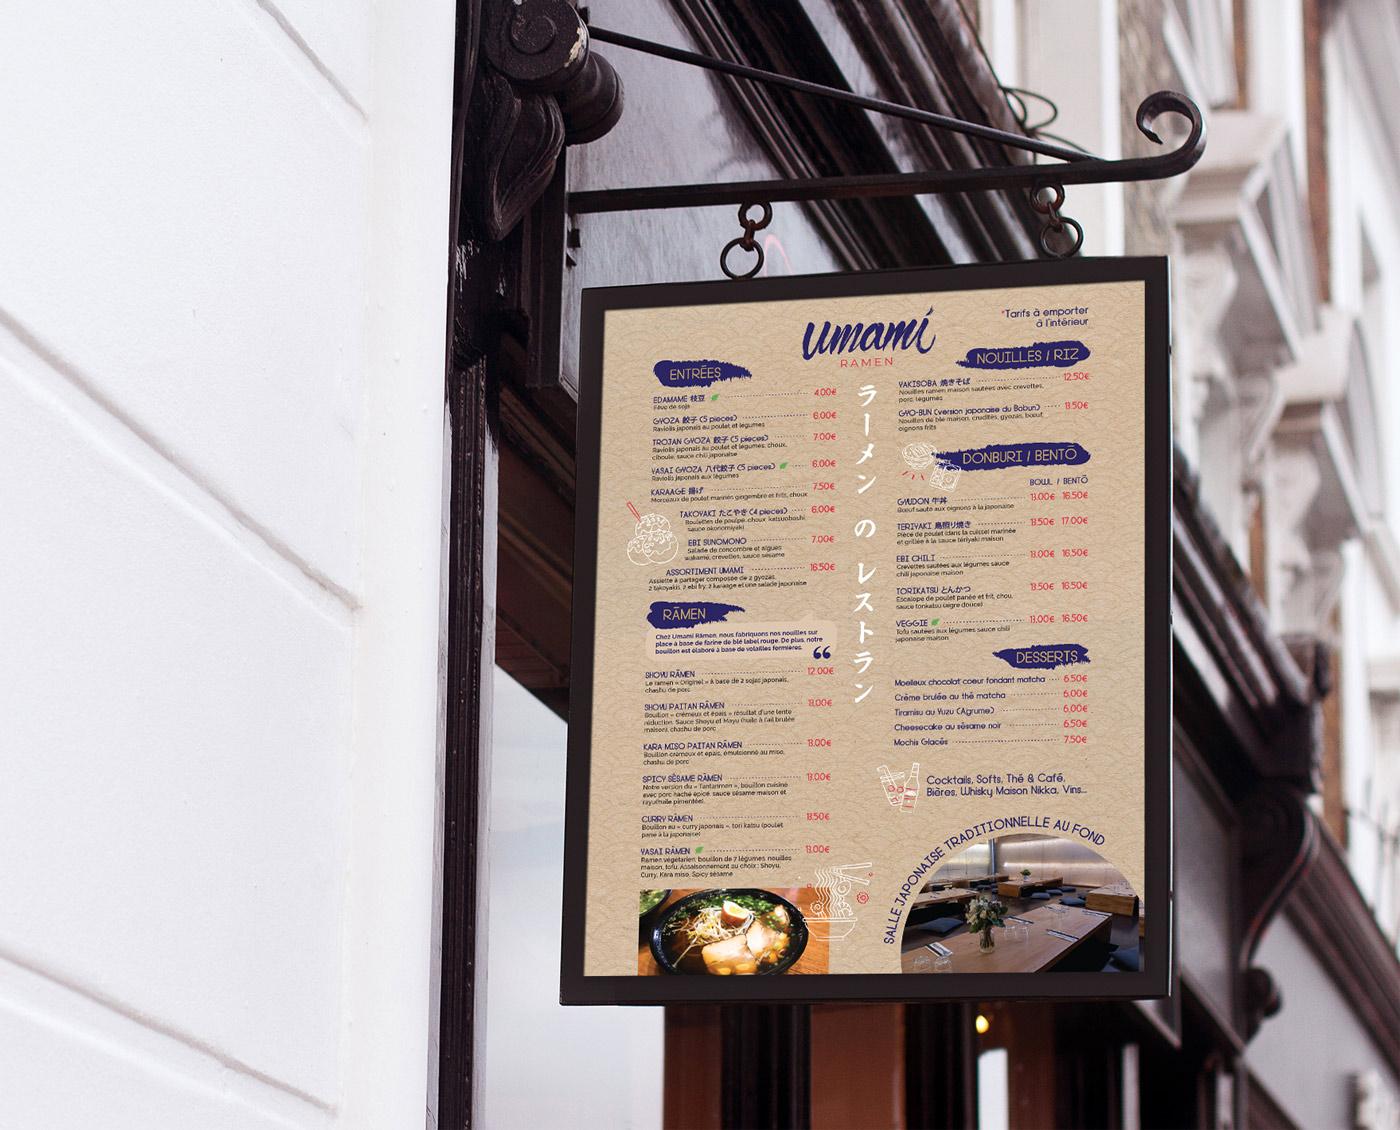 umami1-menu-exterieur-panneau